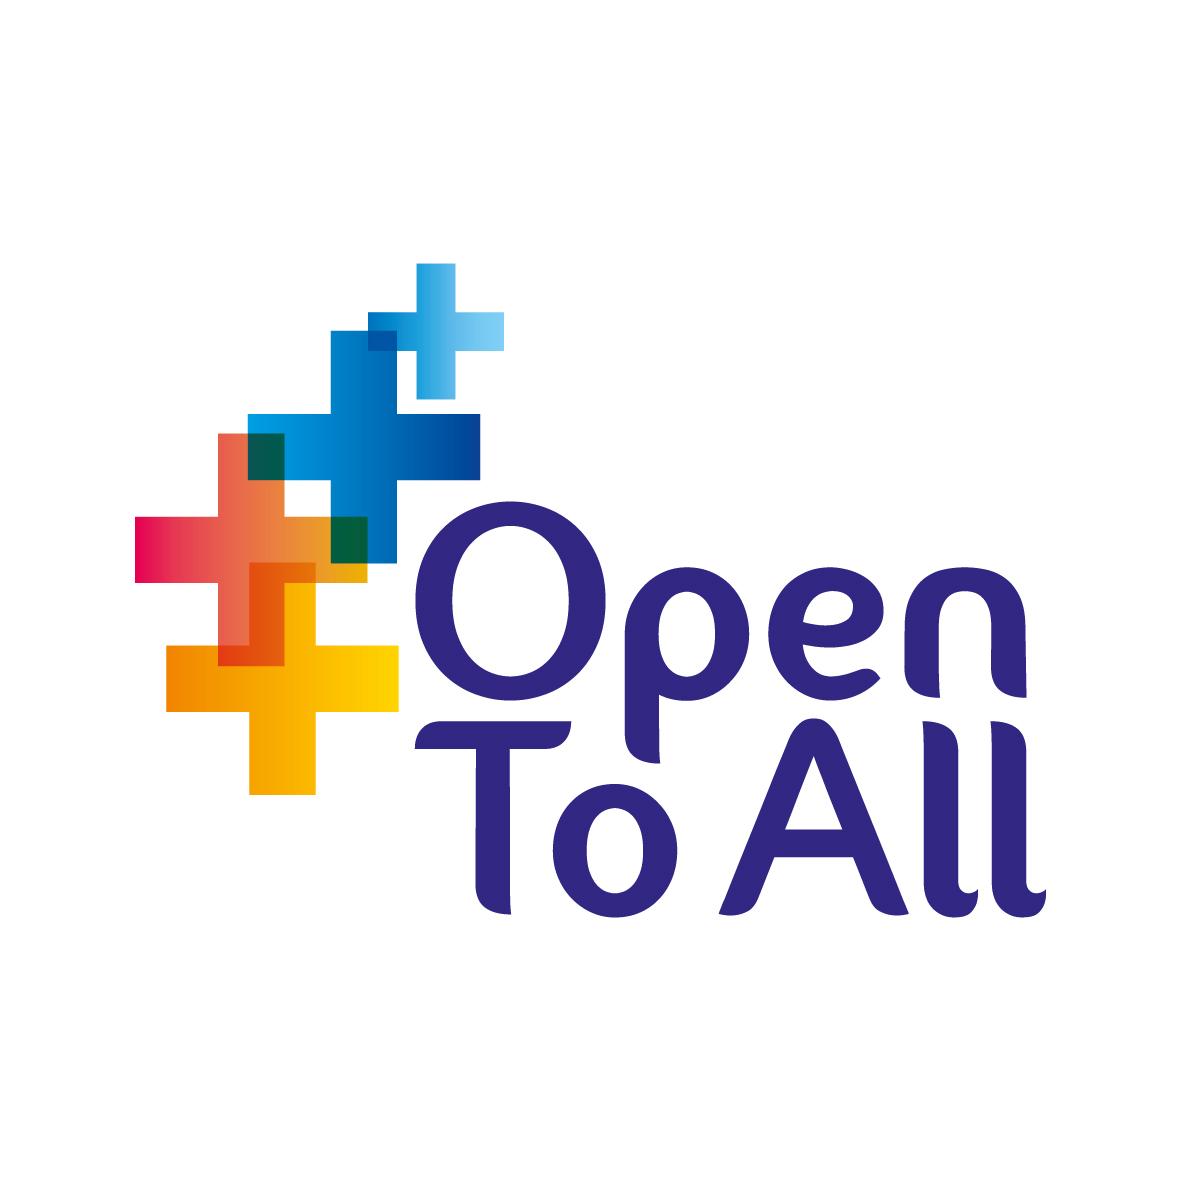 The Children England Open To All scheme logo